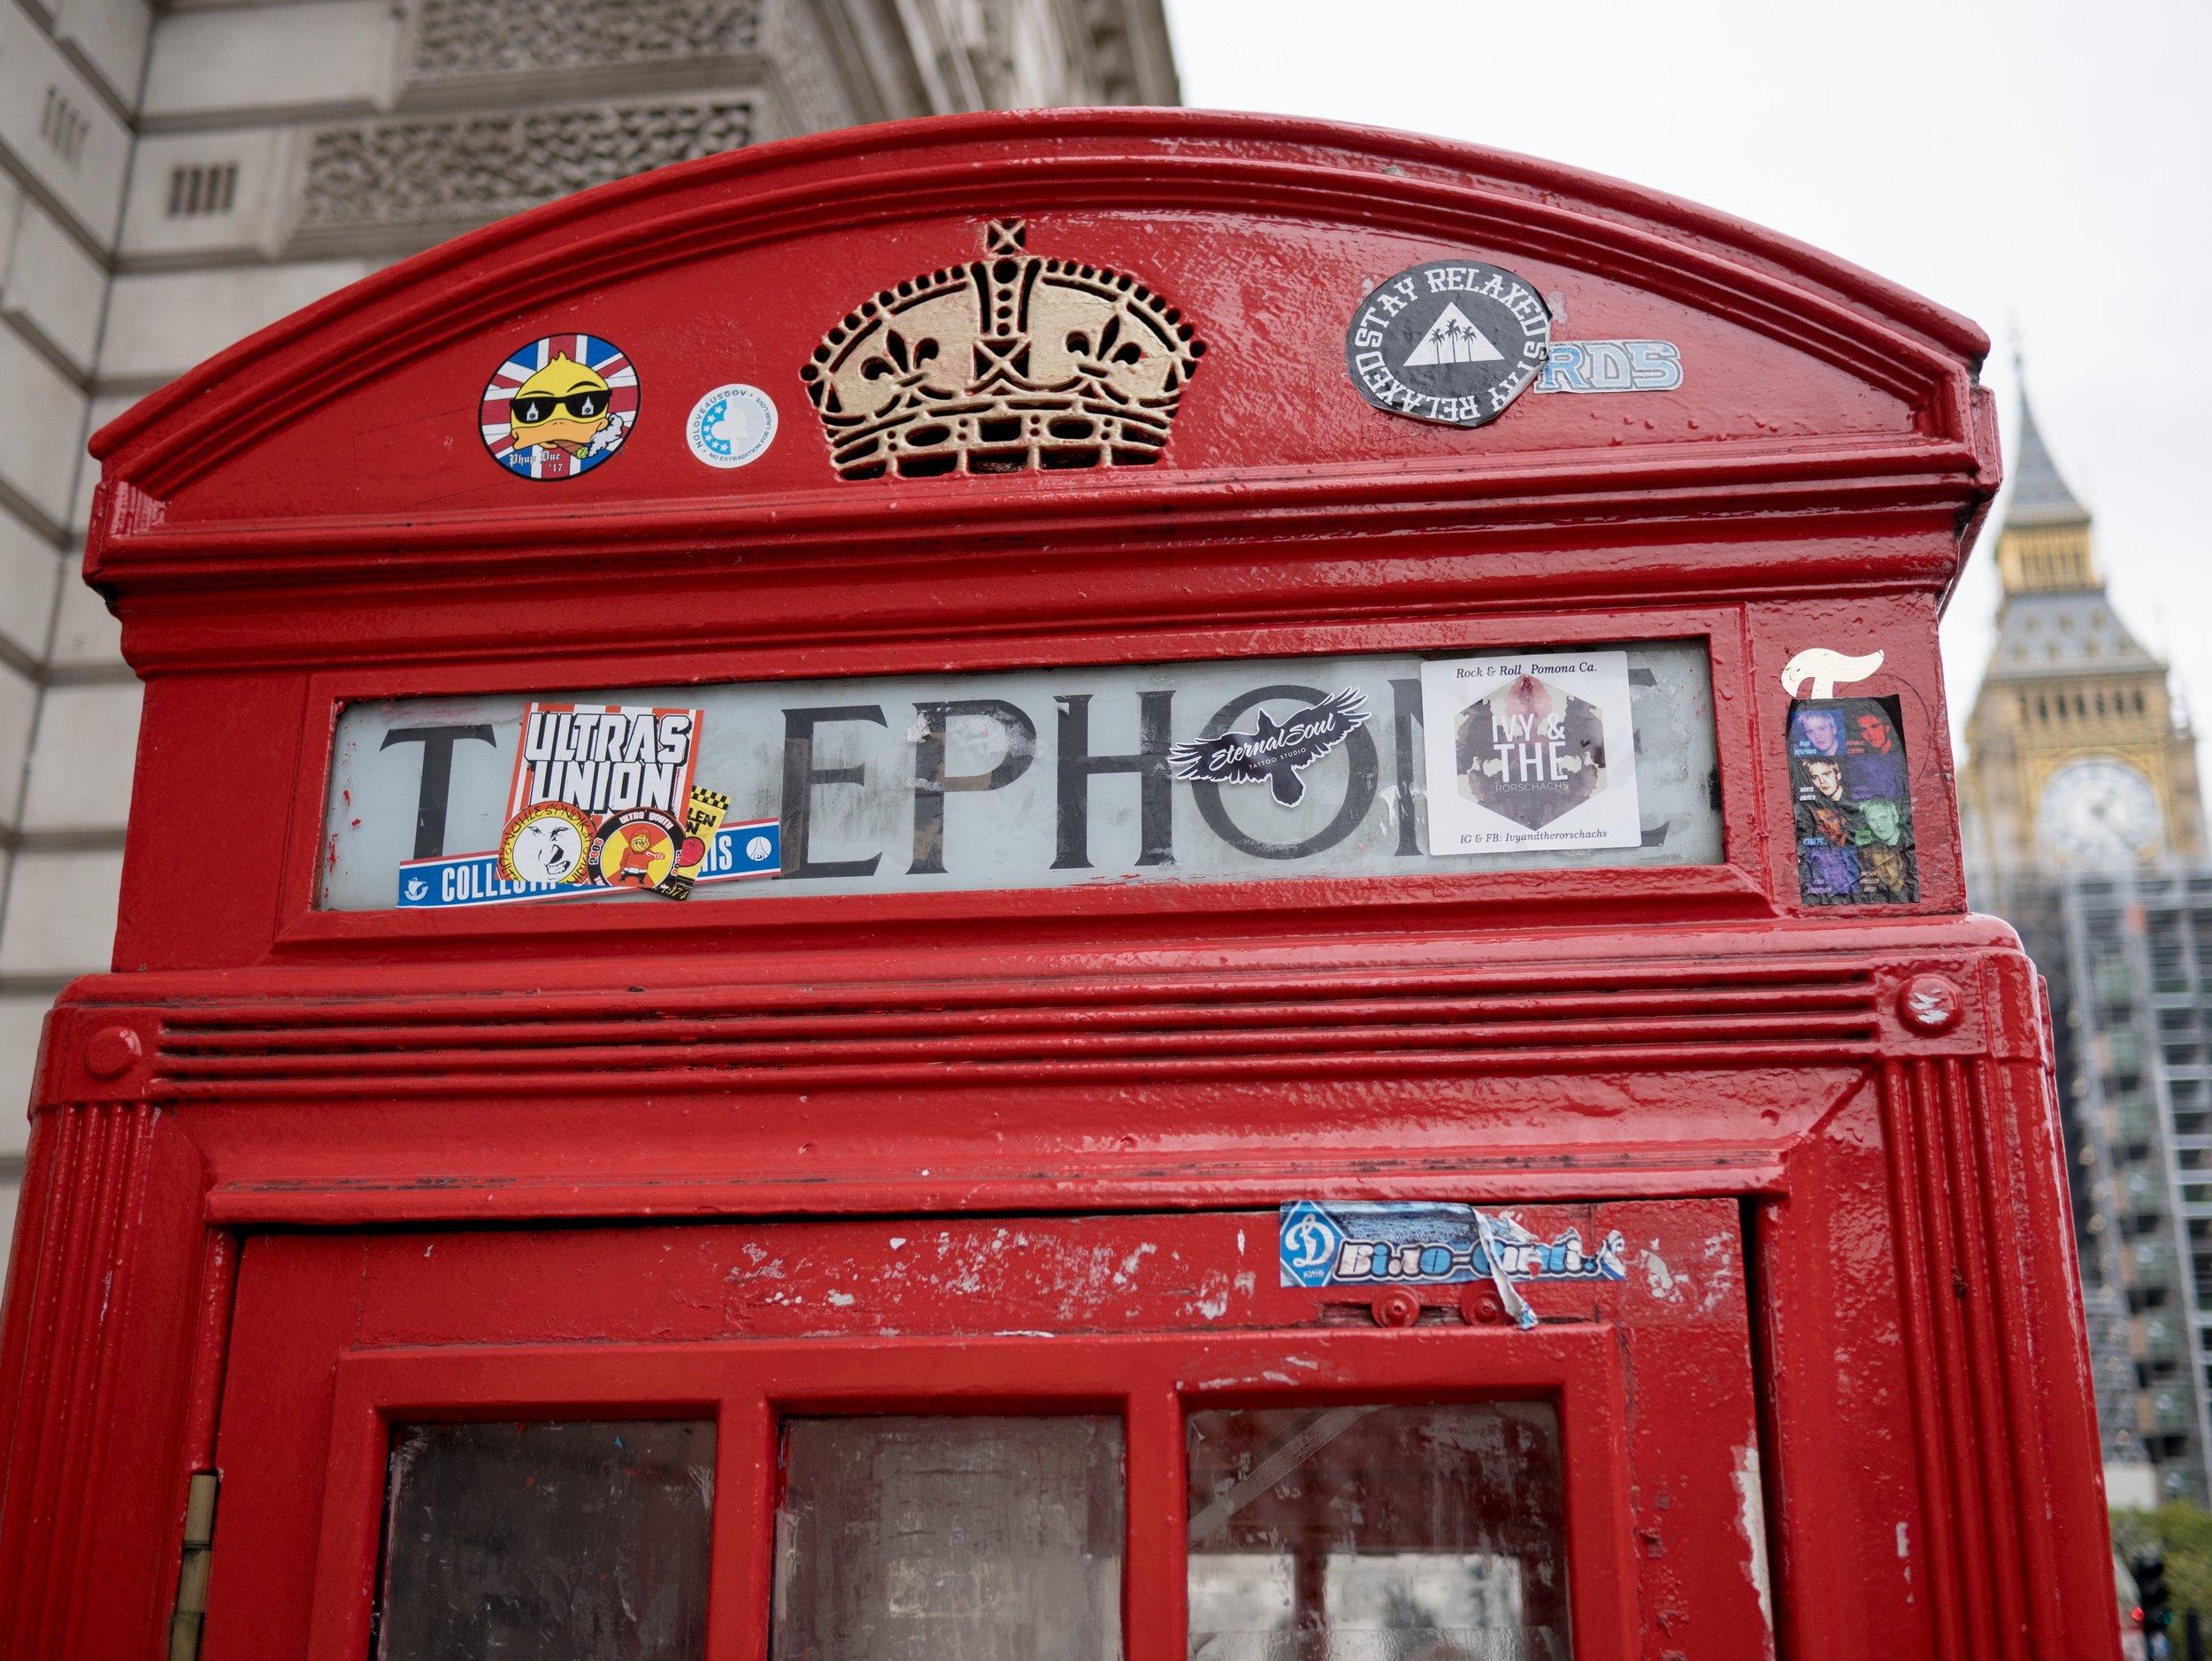 Random Phonebooth in London